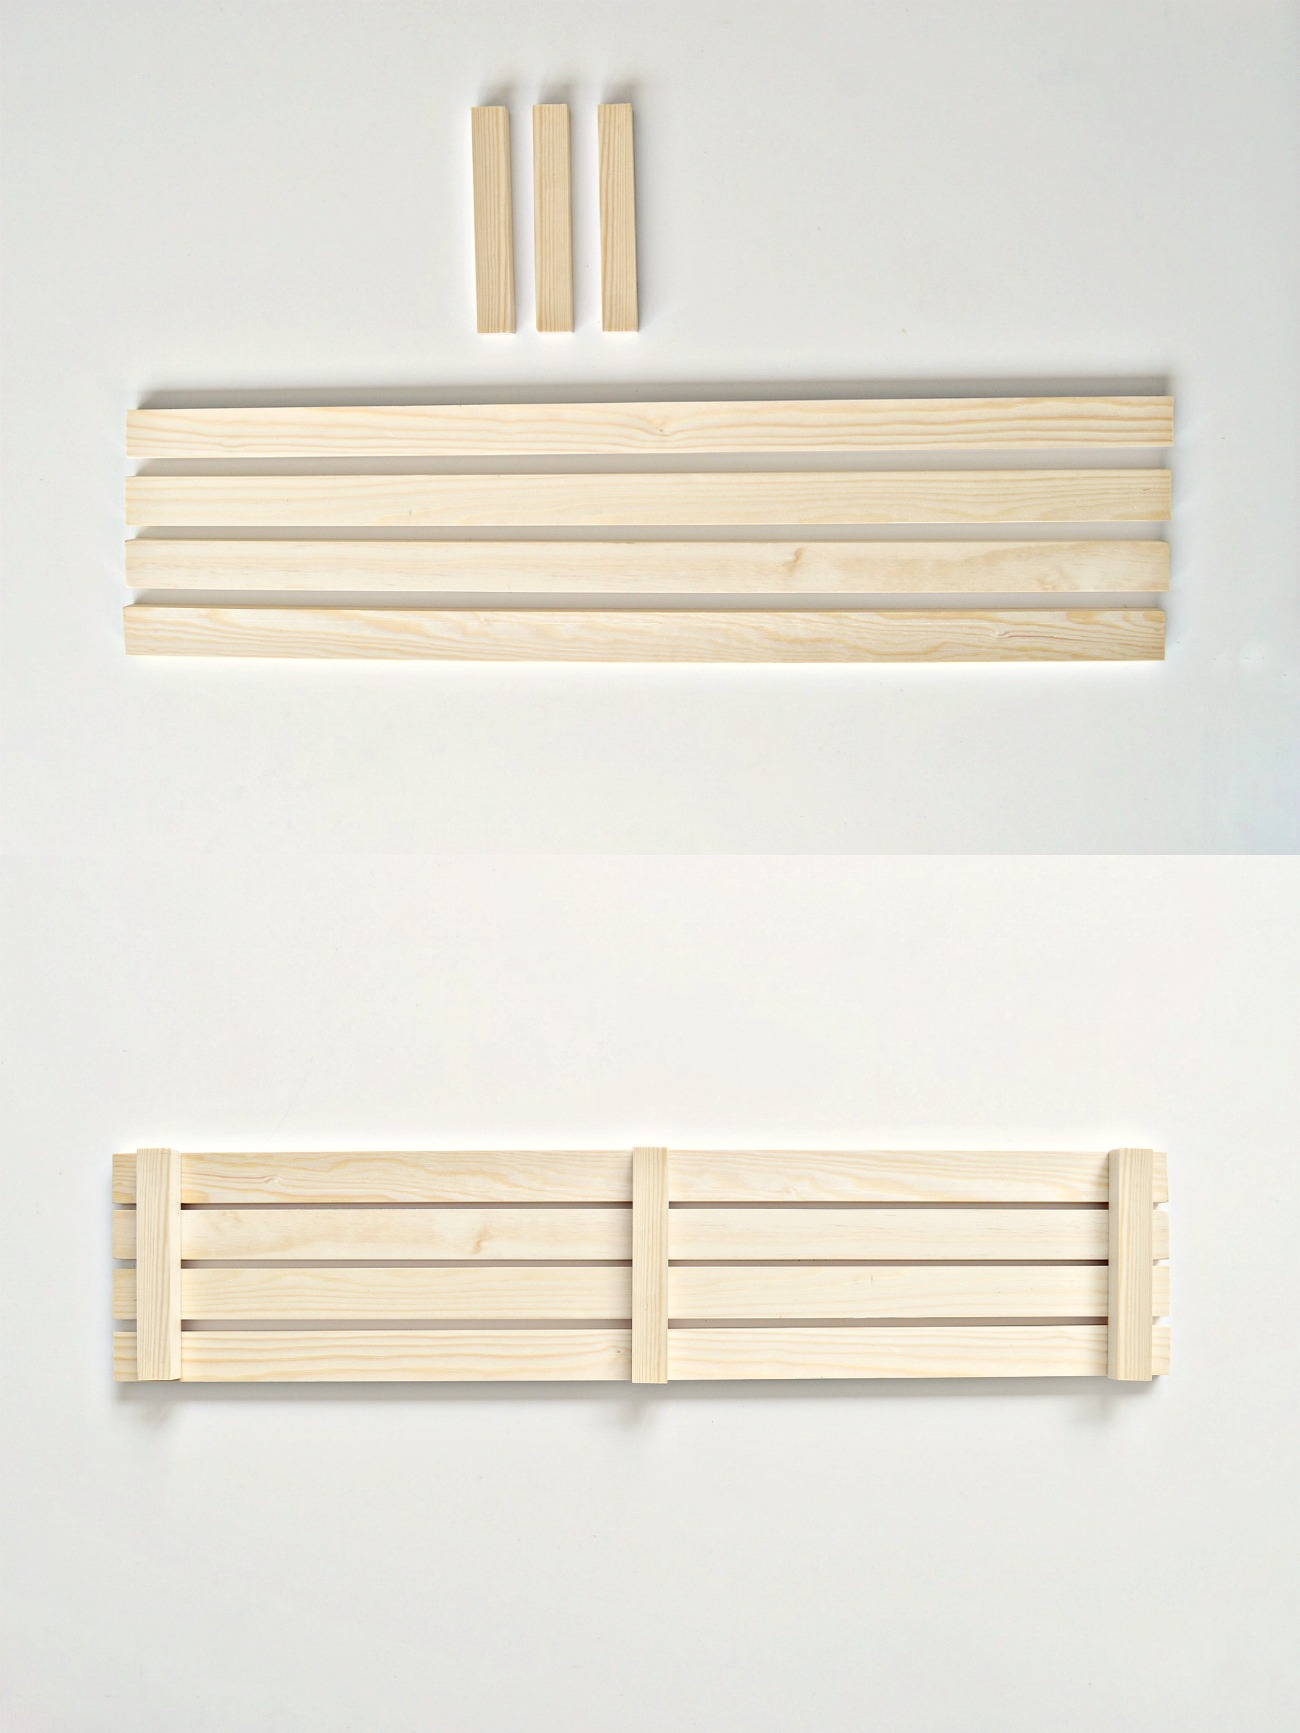 How To Make A Diy Wood Bathtub Tray In Easy Steps